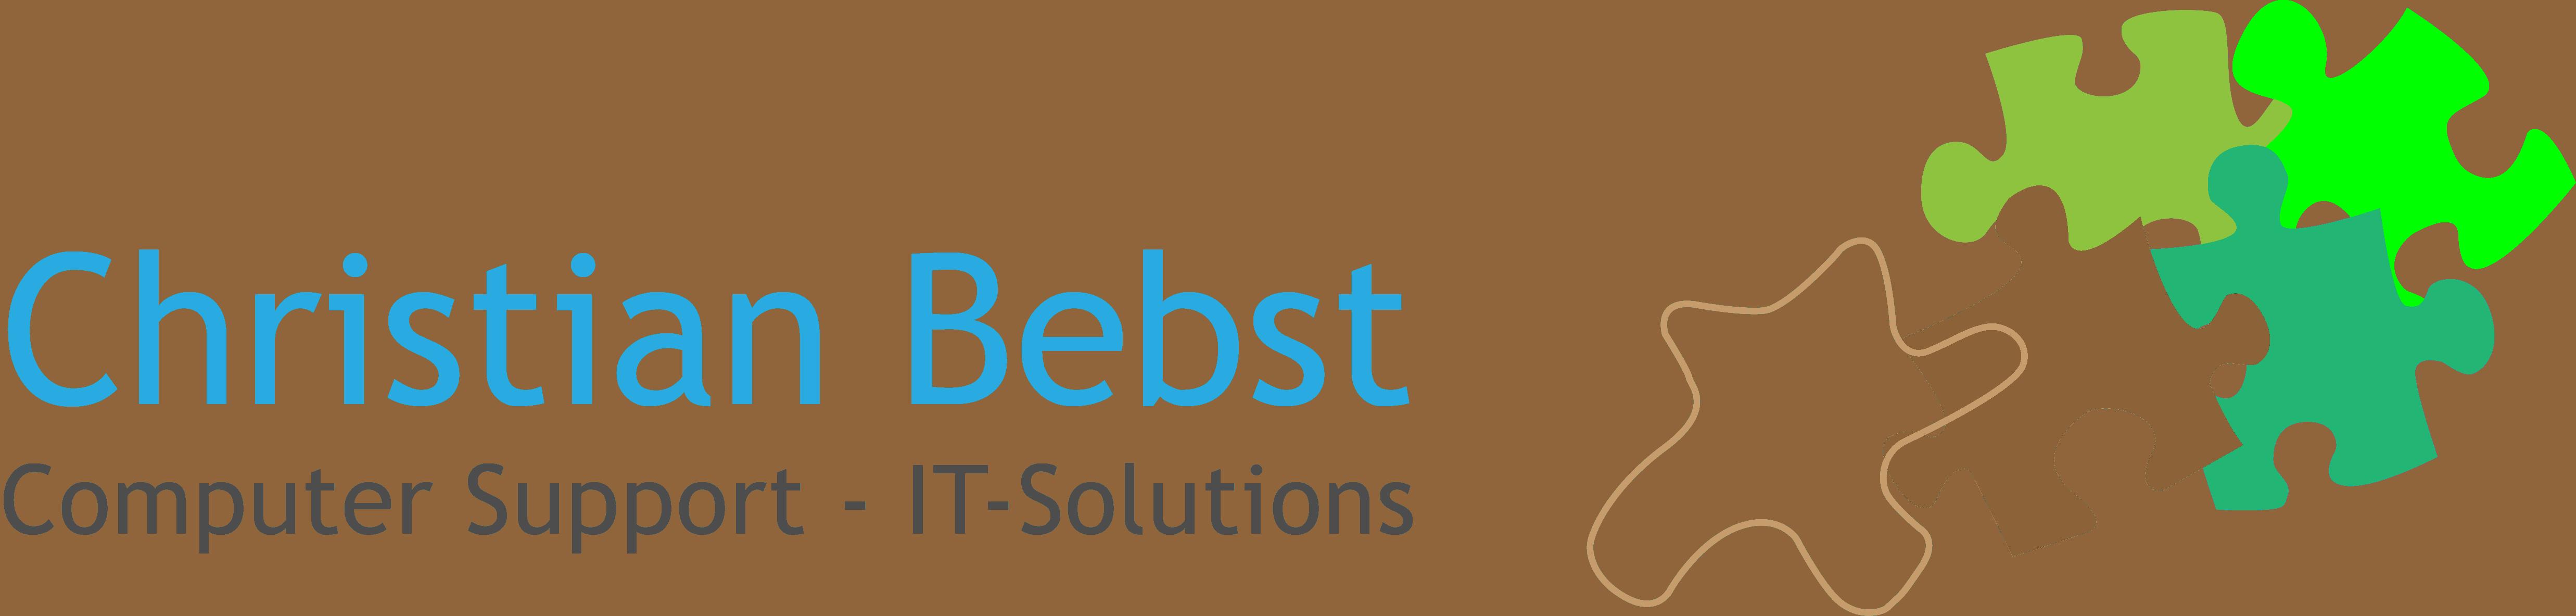 Christian Bebst - Computer Support, IT-Solutions (EDV-Betreuung, Webseiten erstellen, Consulting in Rosenheim, München, Bayern)